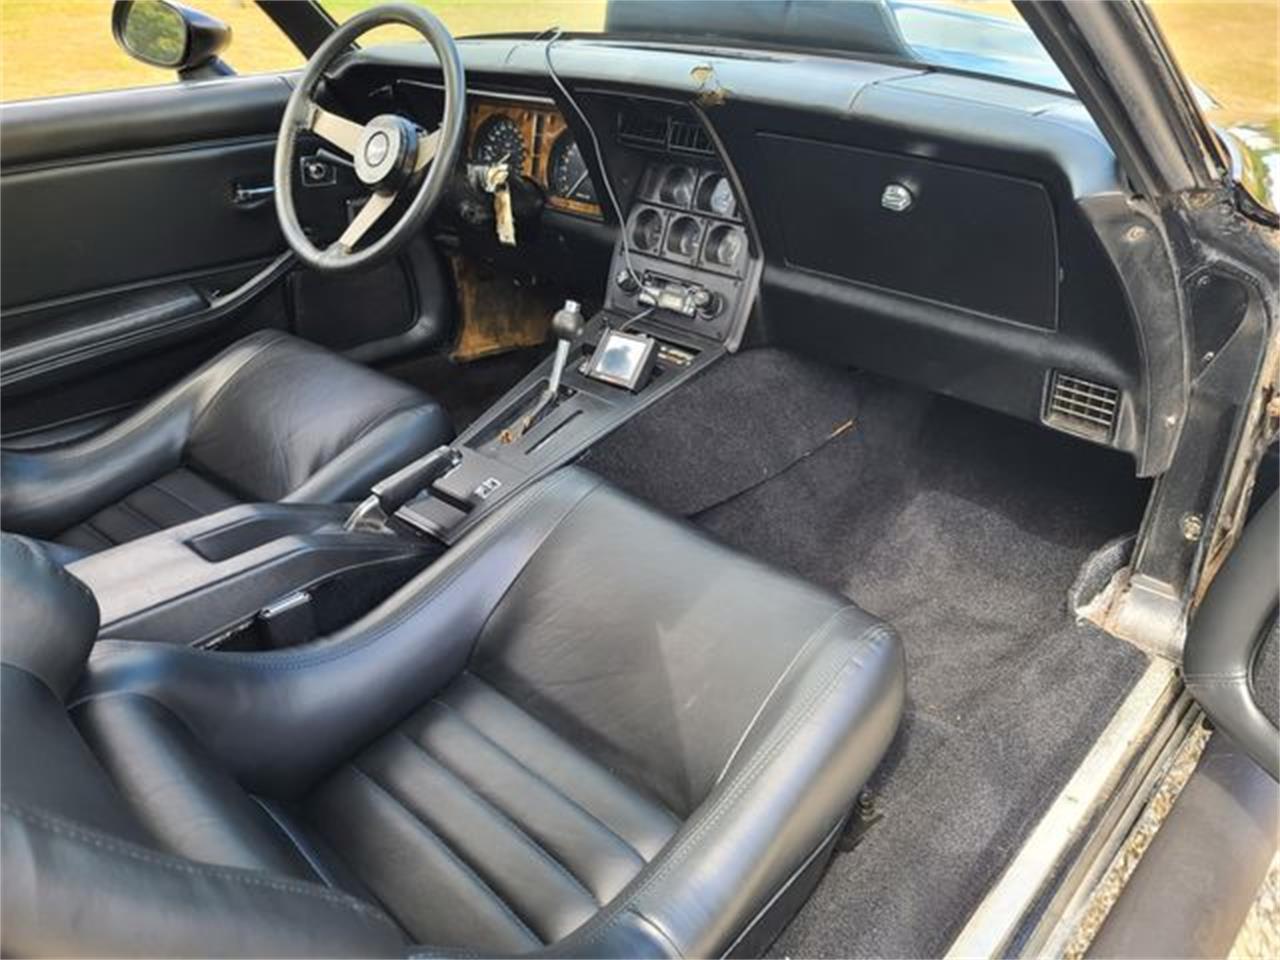 1979 Chevrolet Corvette (CC-1394170) for sale in Hope Mills, North Carolina